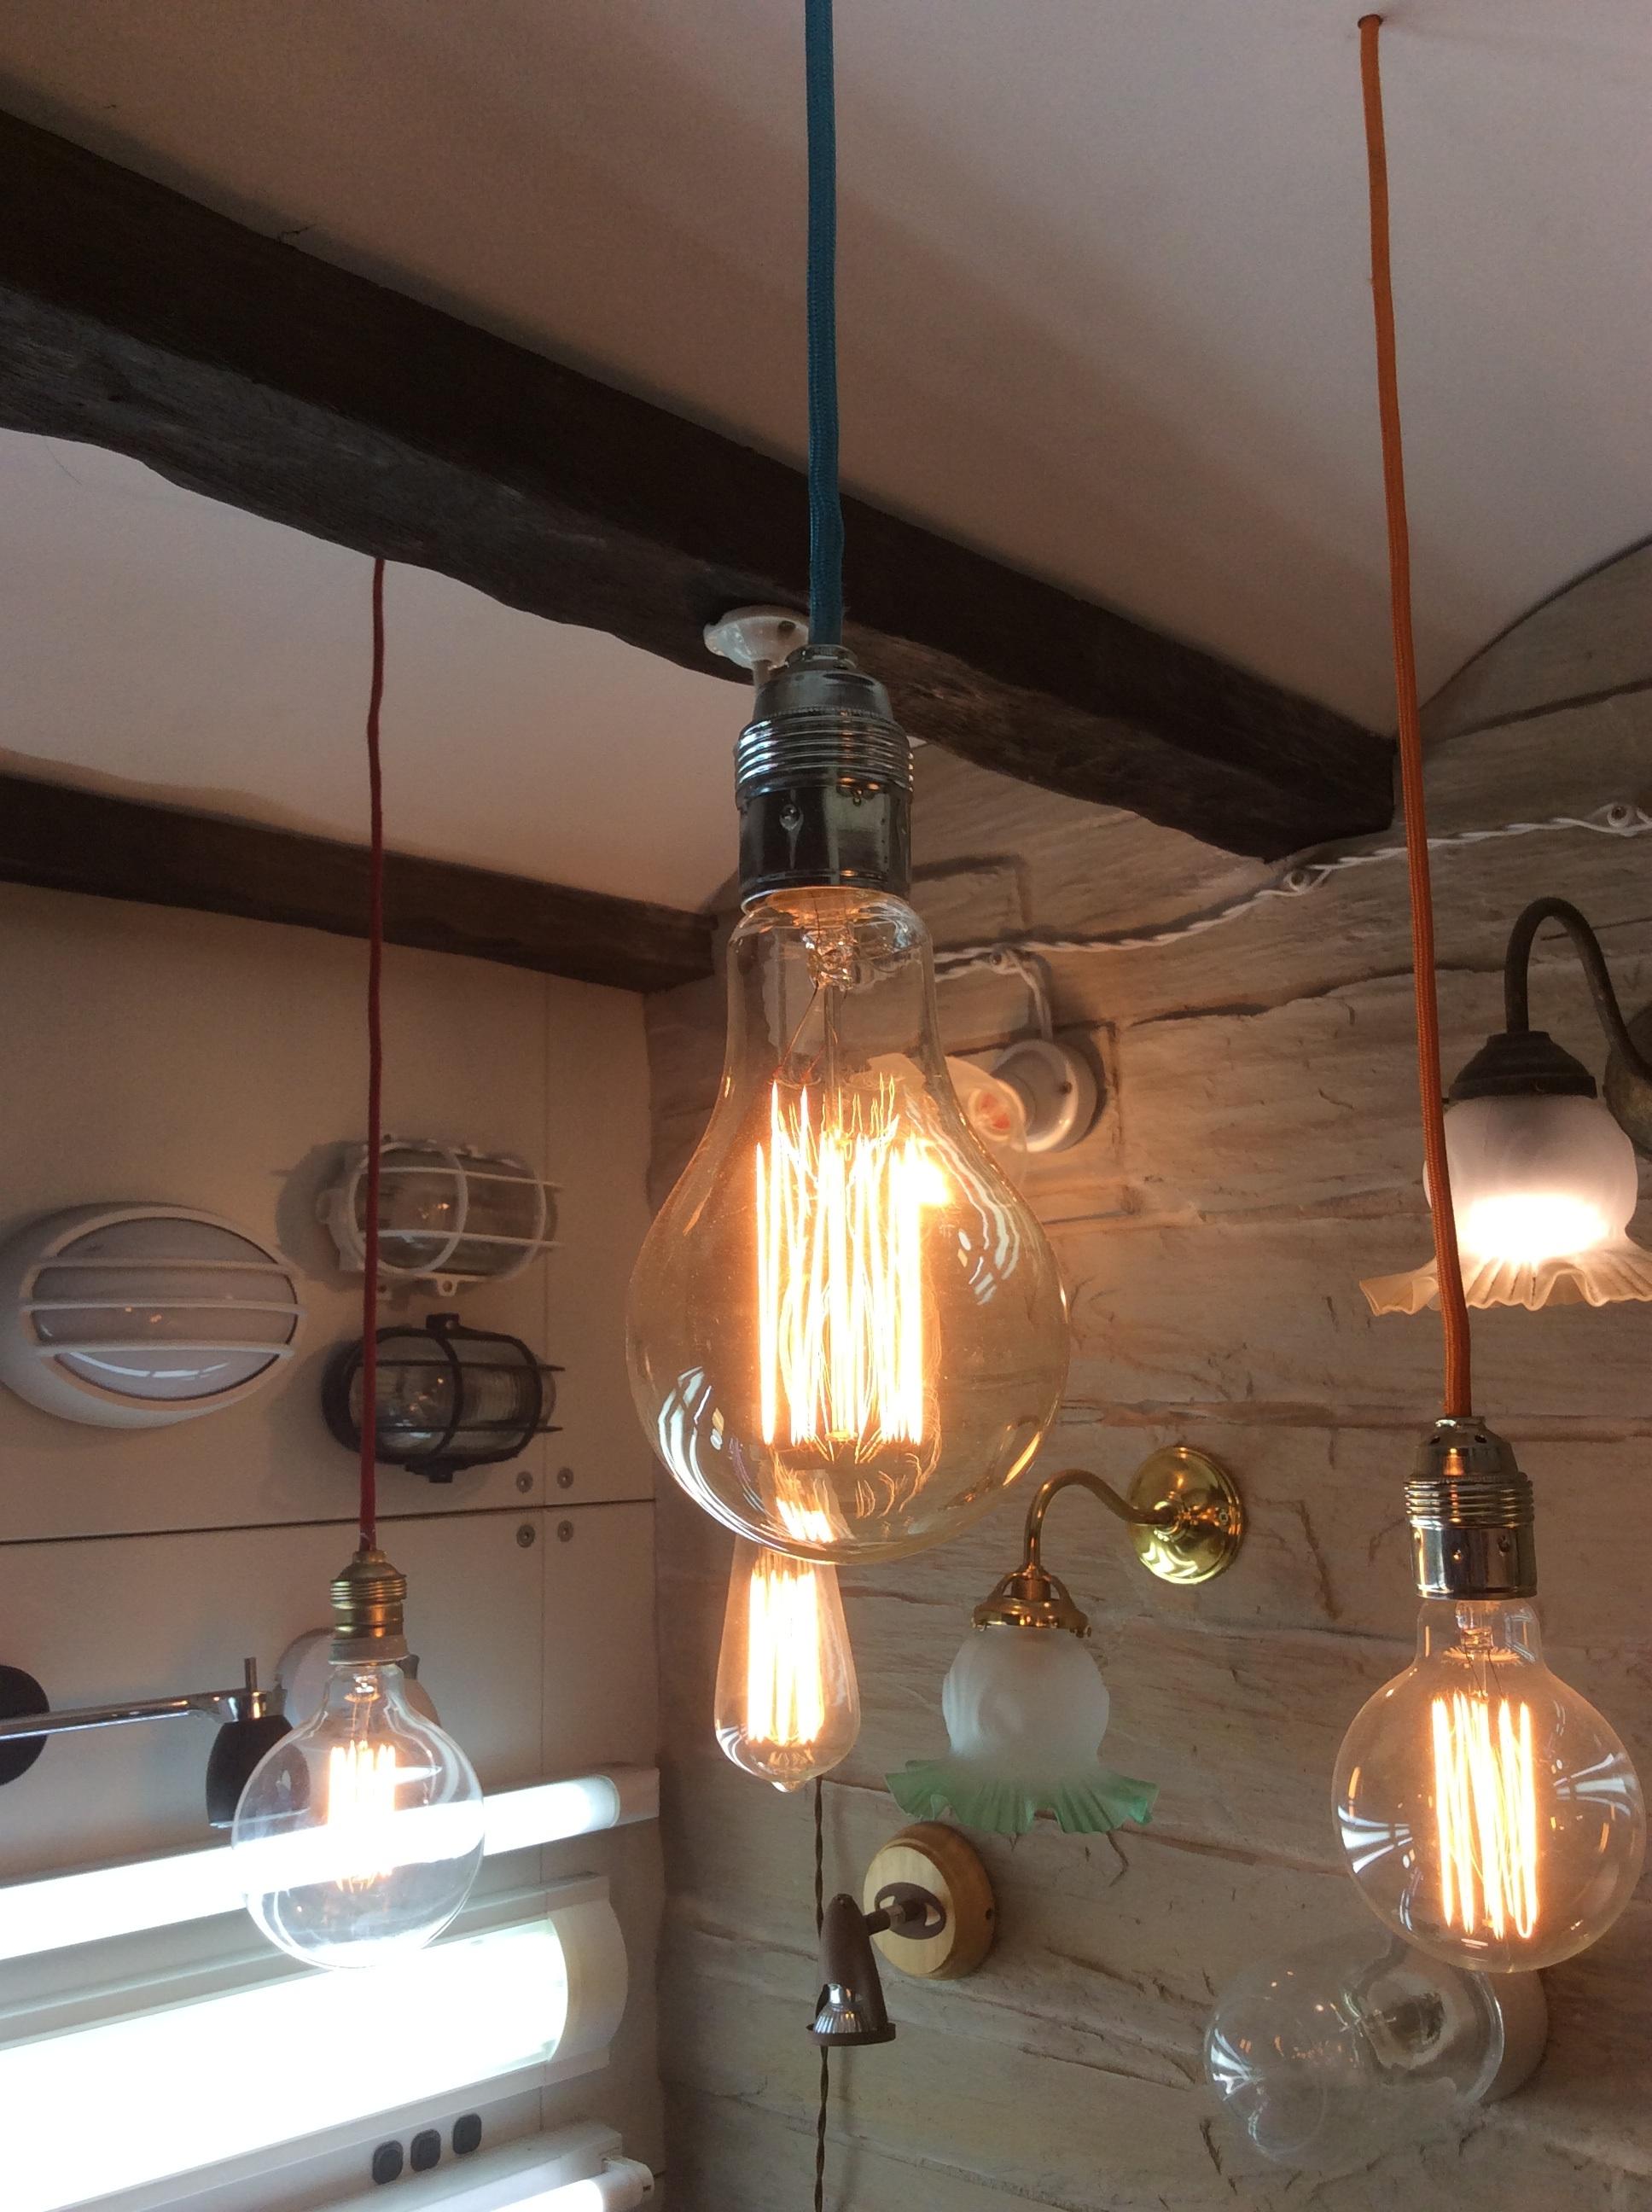 Gratis Afbeeldingen : licht, architectuur, retro, oud, rustiek ...